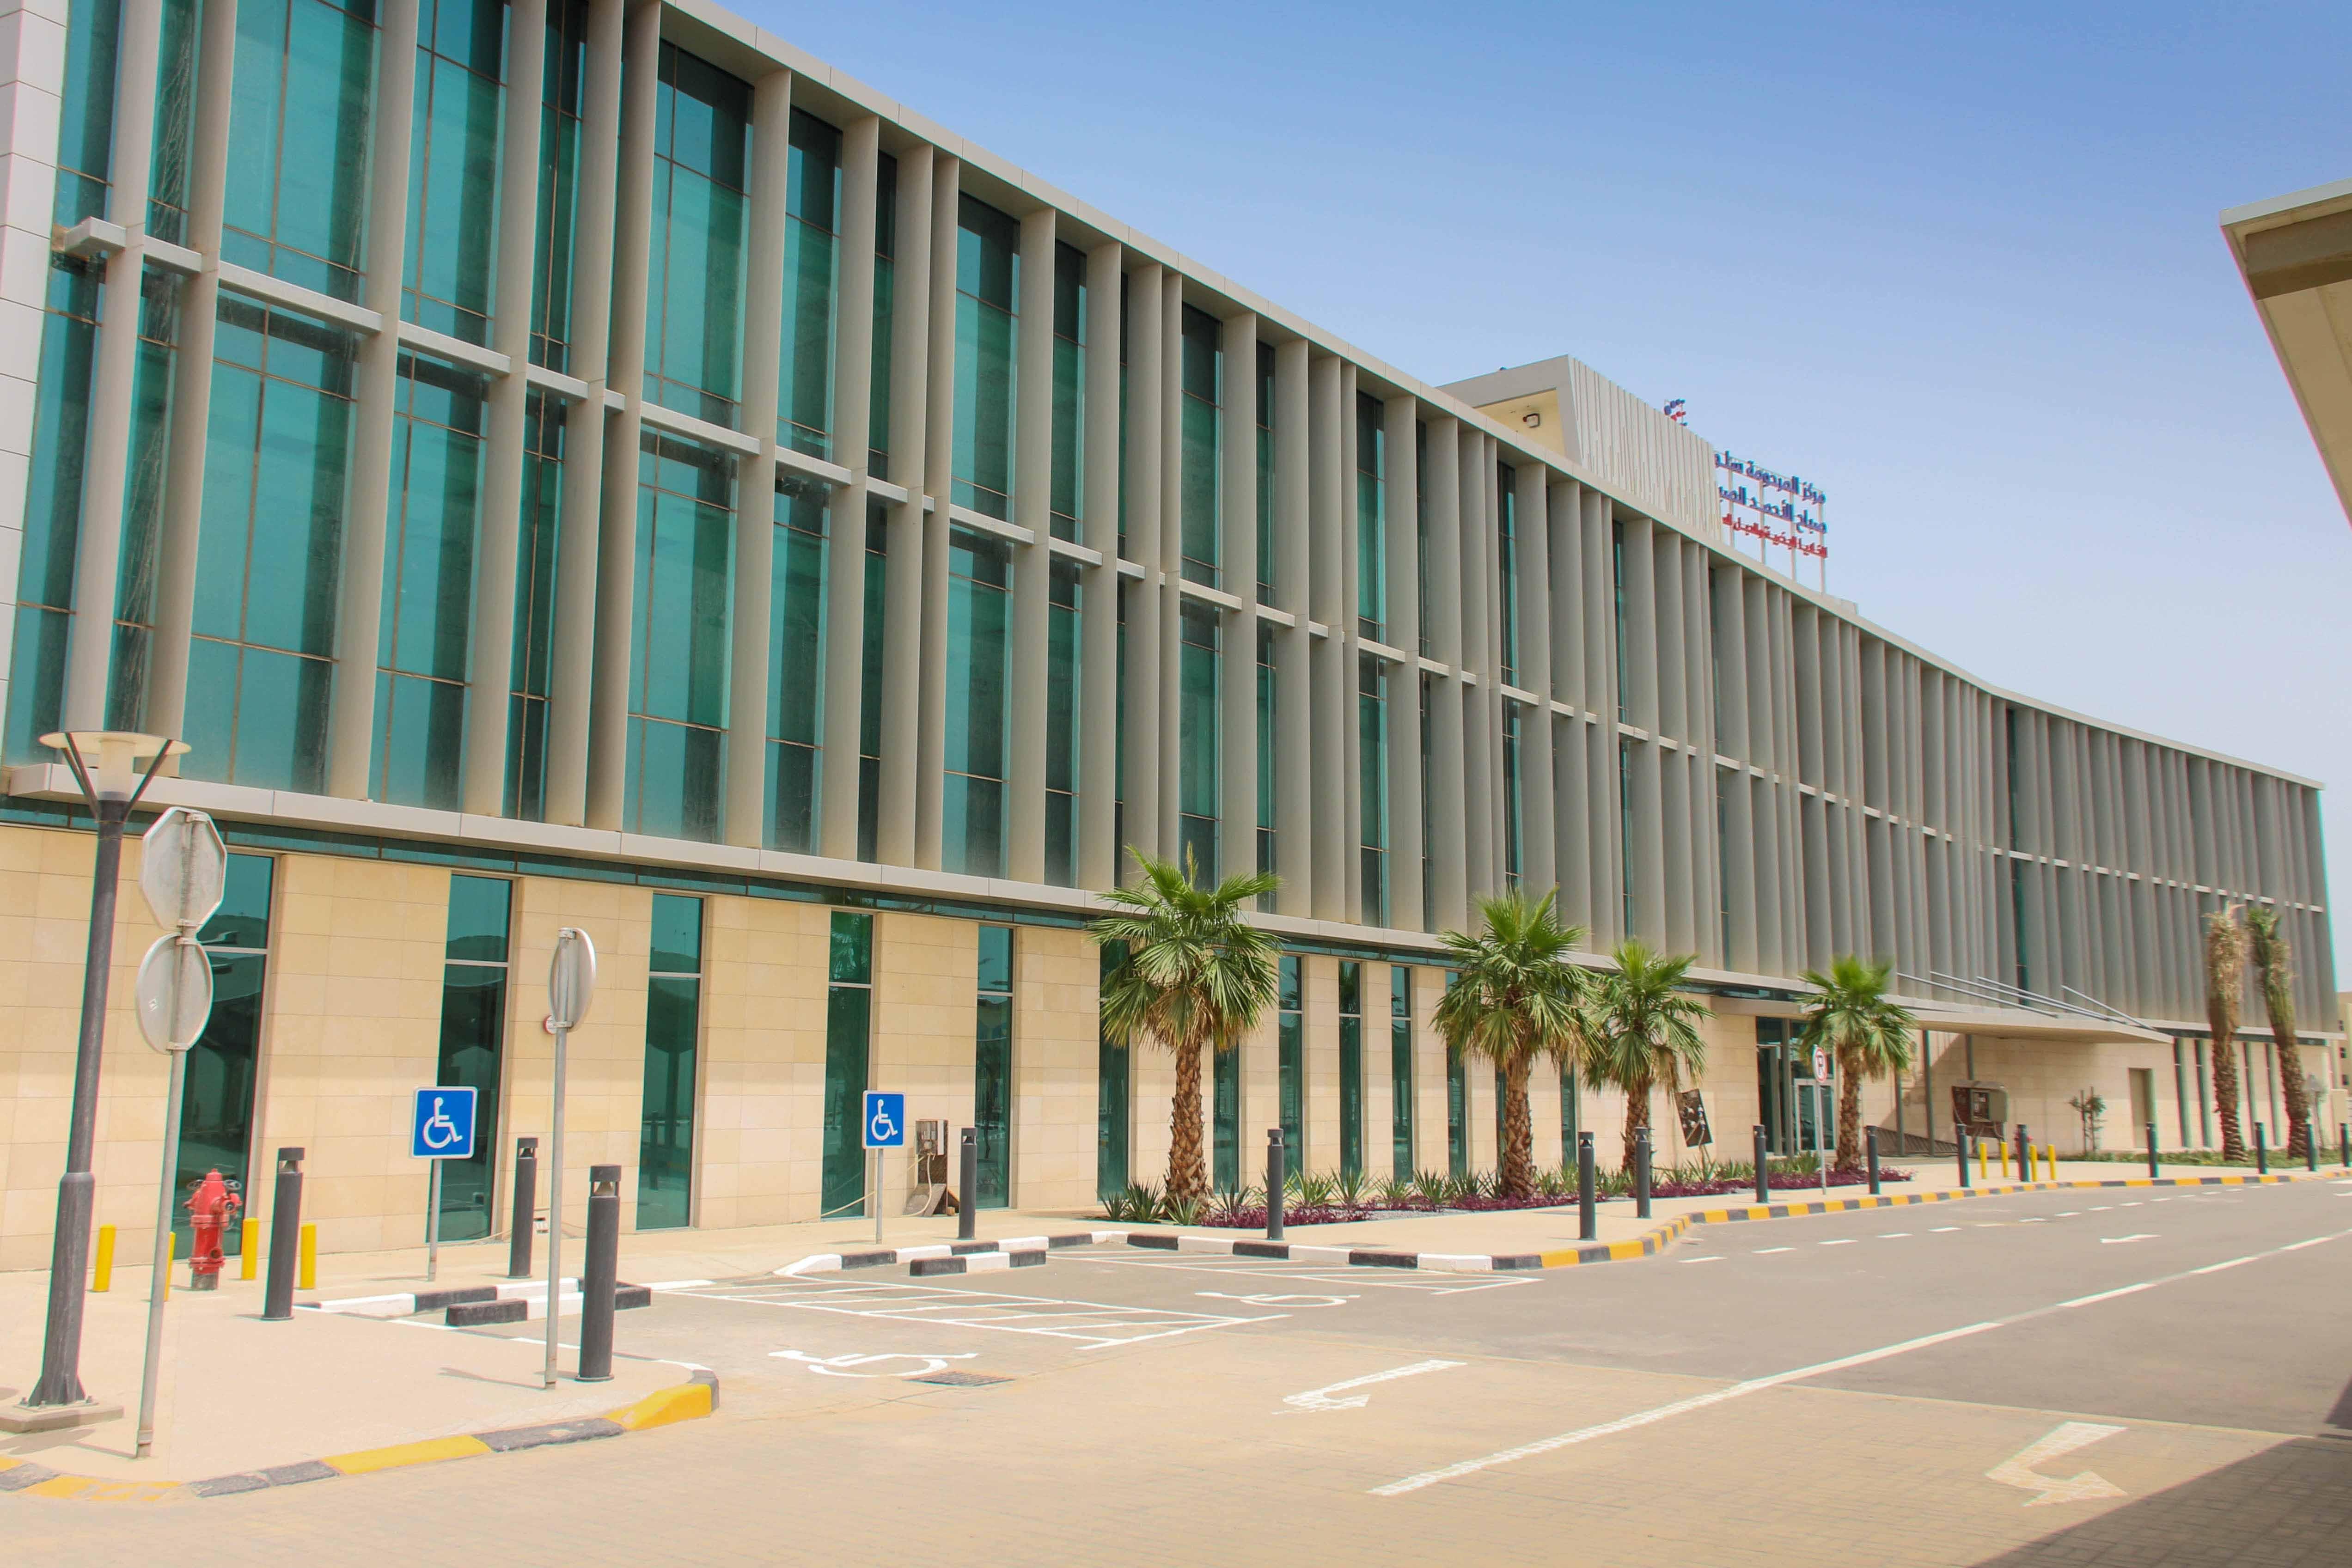 The Late Salwa Sabah Al Ahmad Al Sabah Stem Cell and Umbilical Cord Centre 0